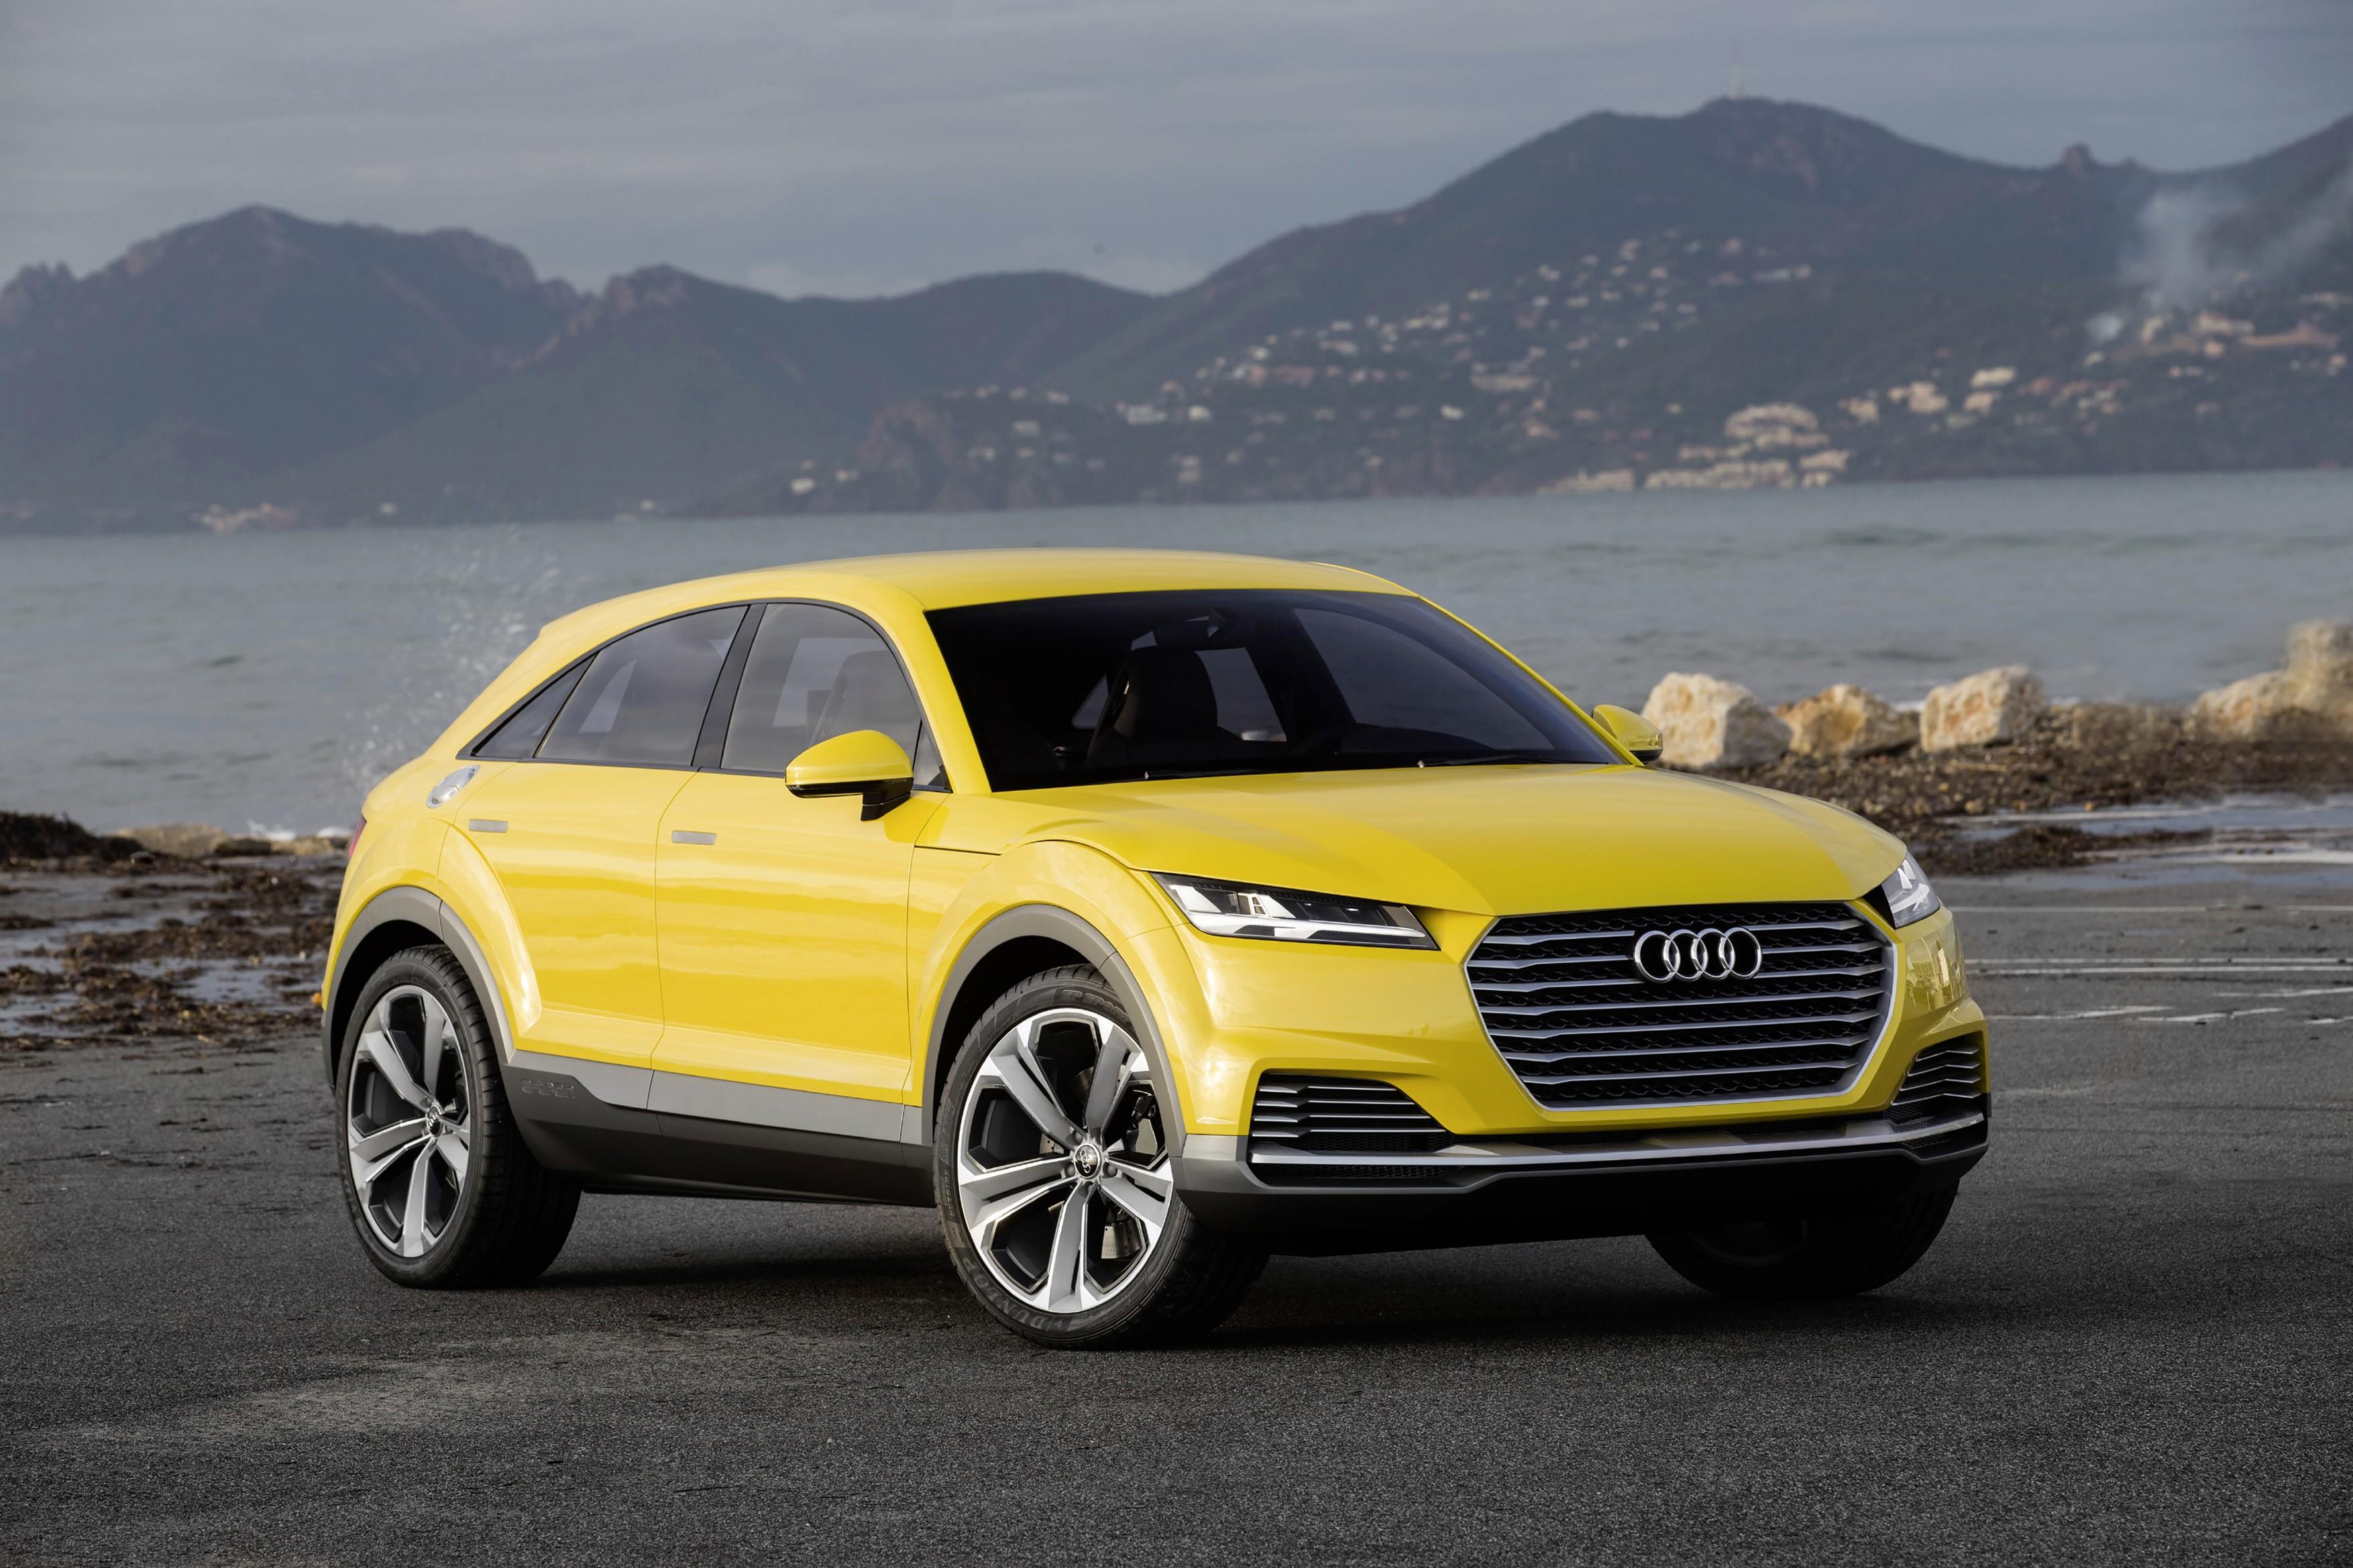 Audi Delays Development of AllNew A3 and Q4 Due to Emissions